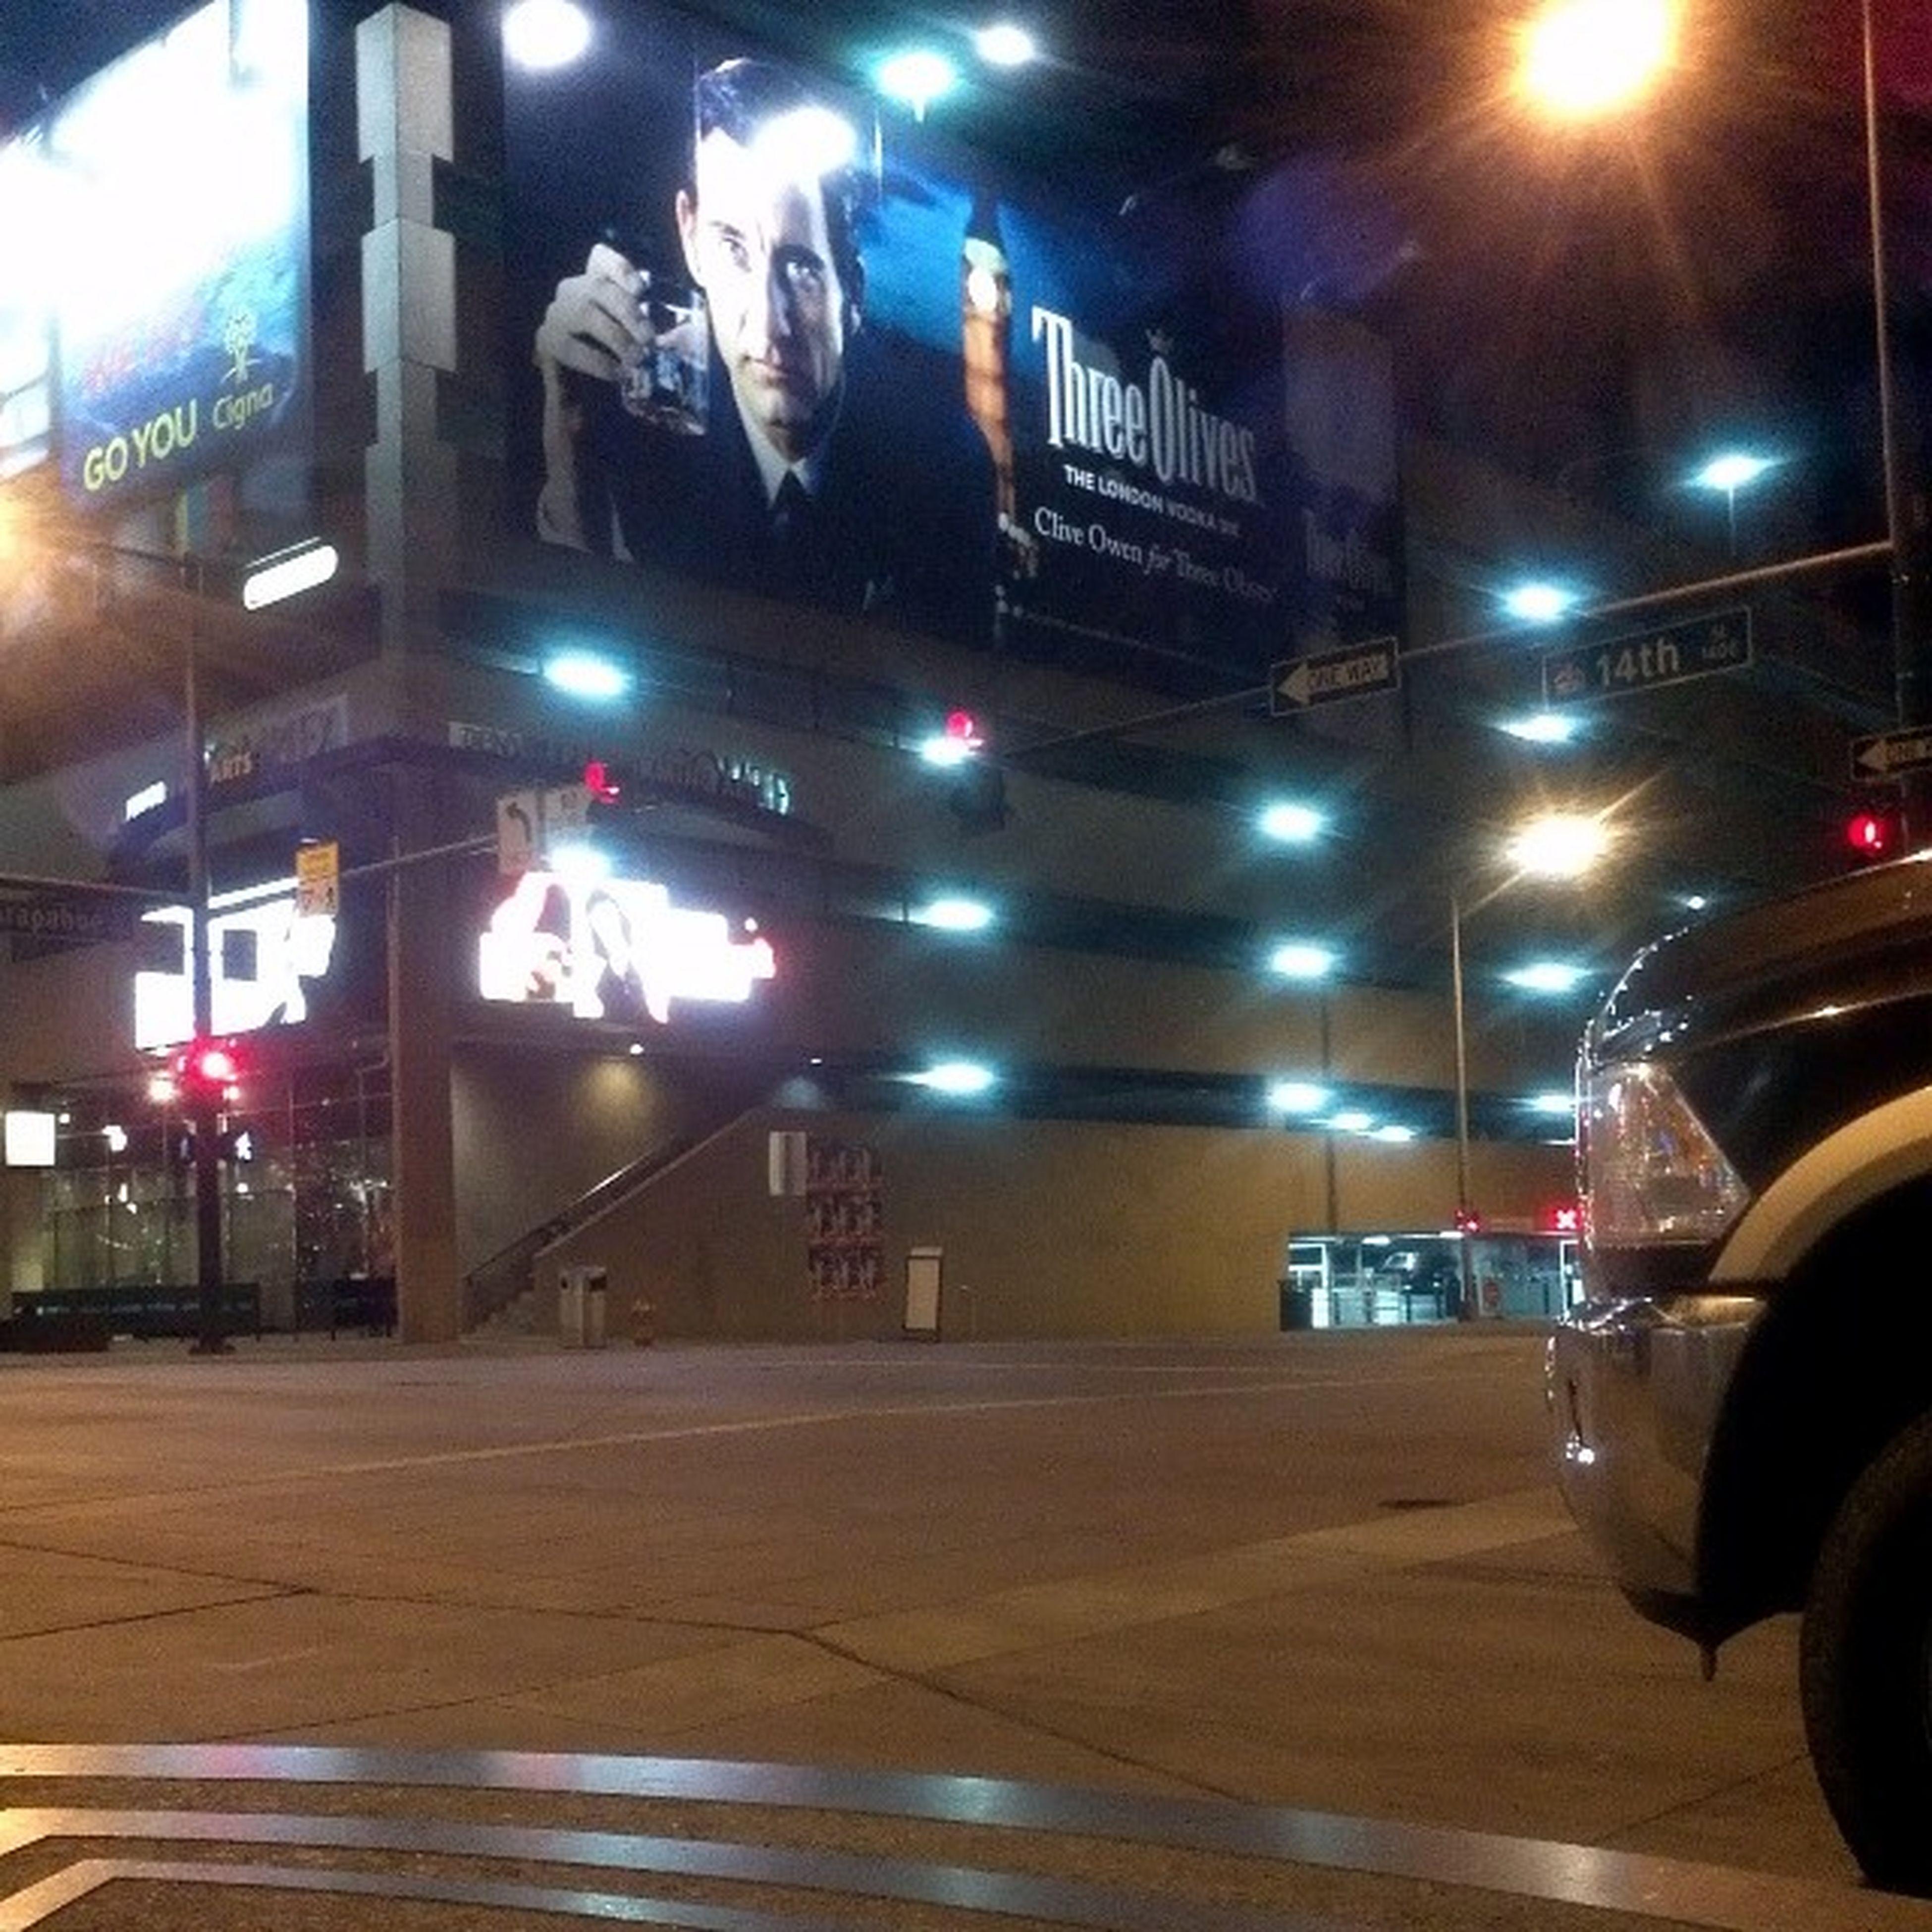 3 olives swag and real life starburst :-) Denvernightlife Denver Arapahoe Swag instalike milehigh downtown colorado chillin vacation 2014 instagood like4likes like photo me street photooftheday fun follow followforfollow followme okill3rjesuso